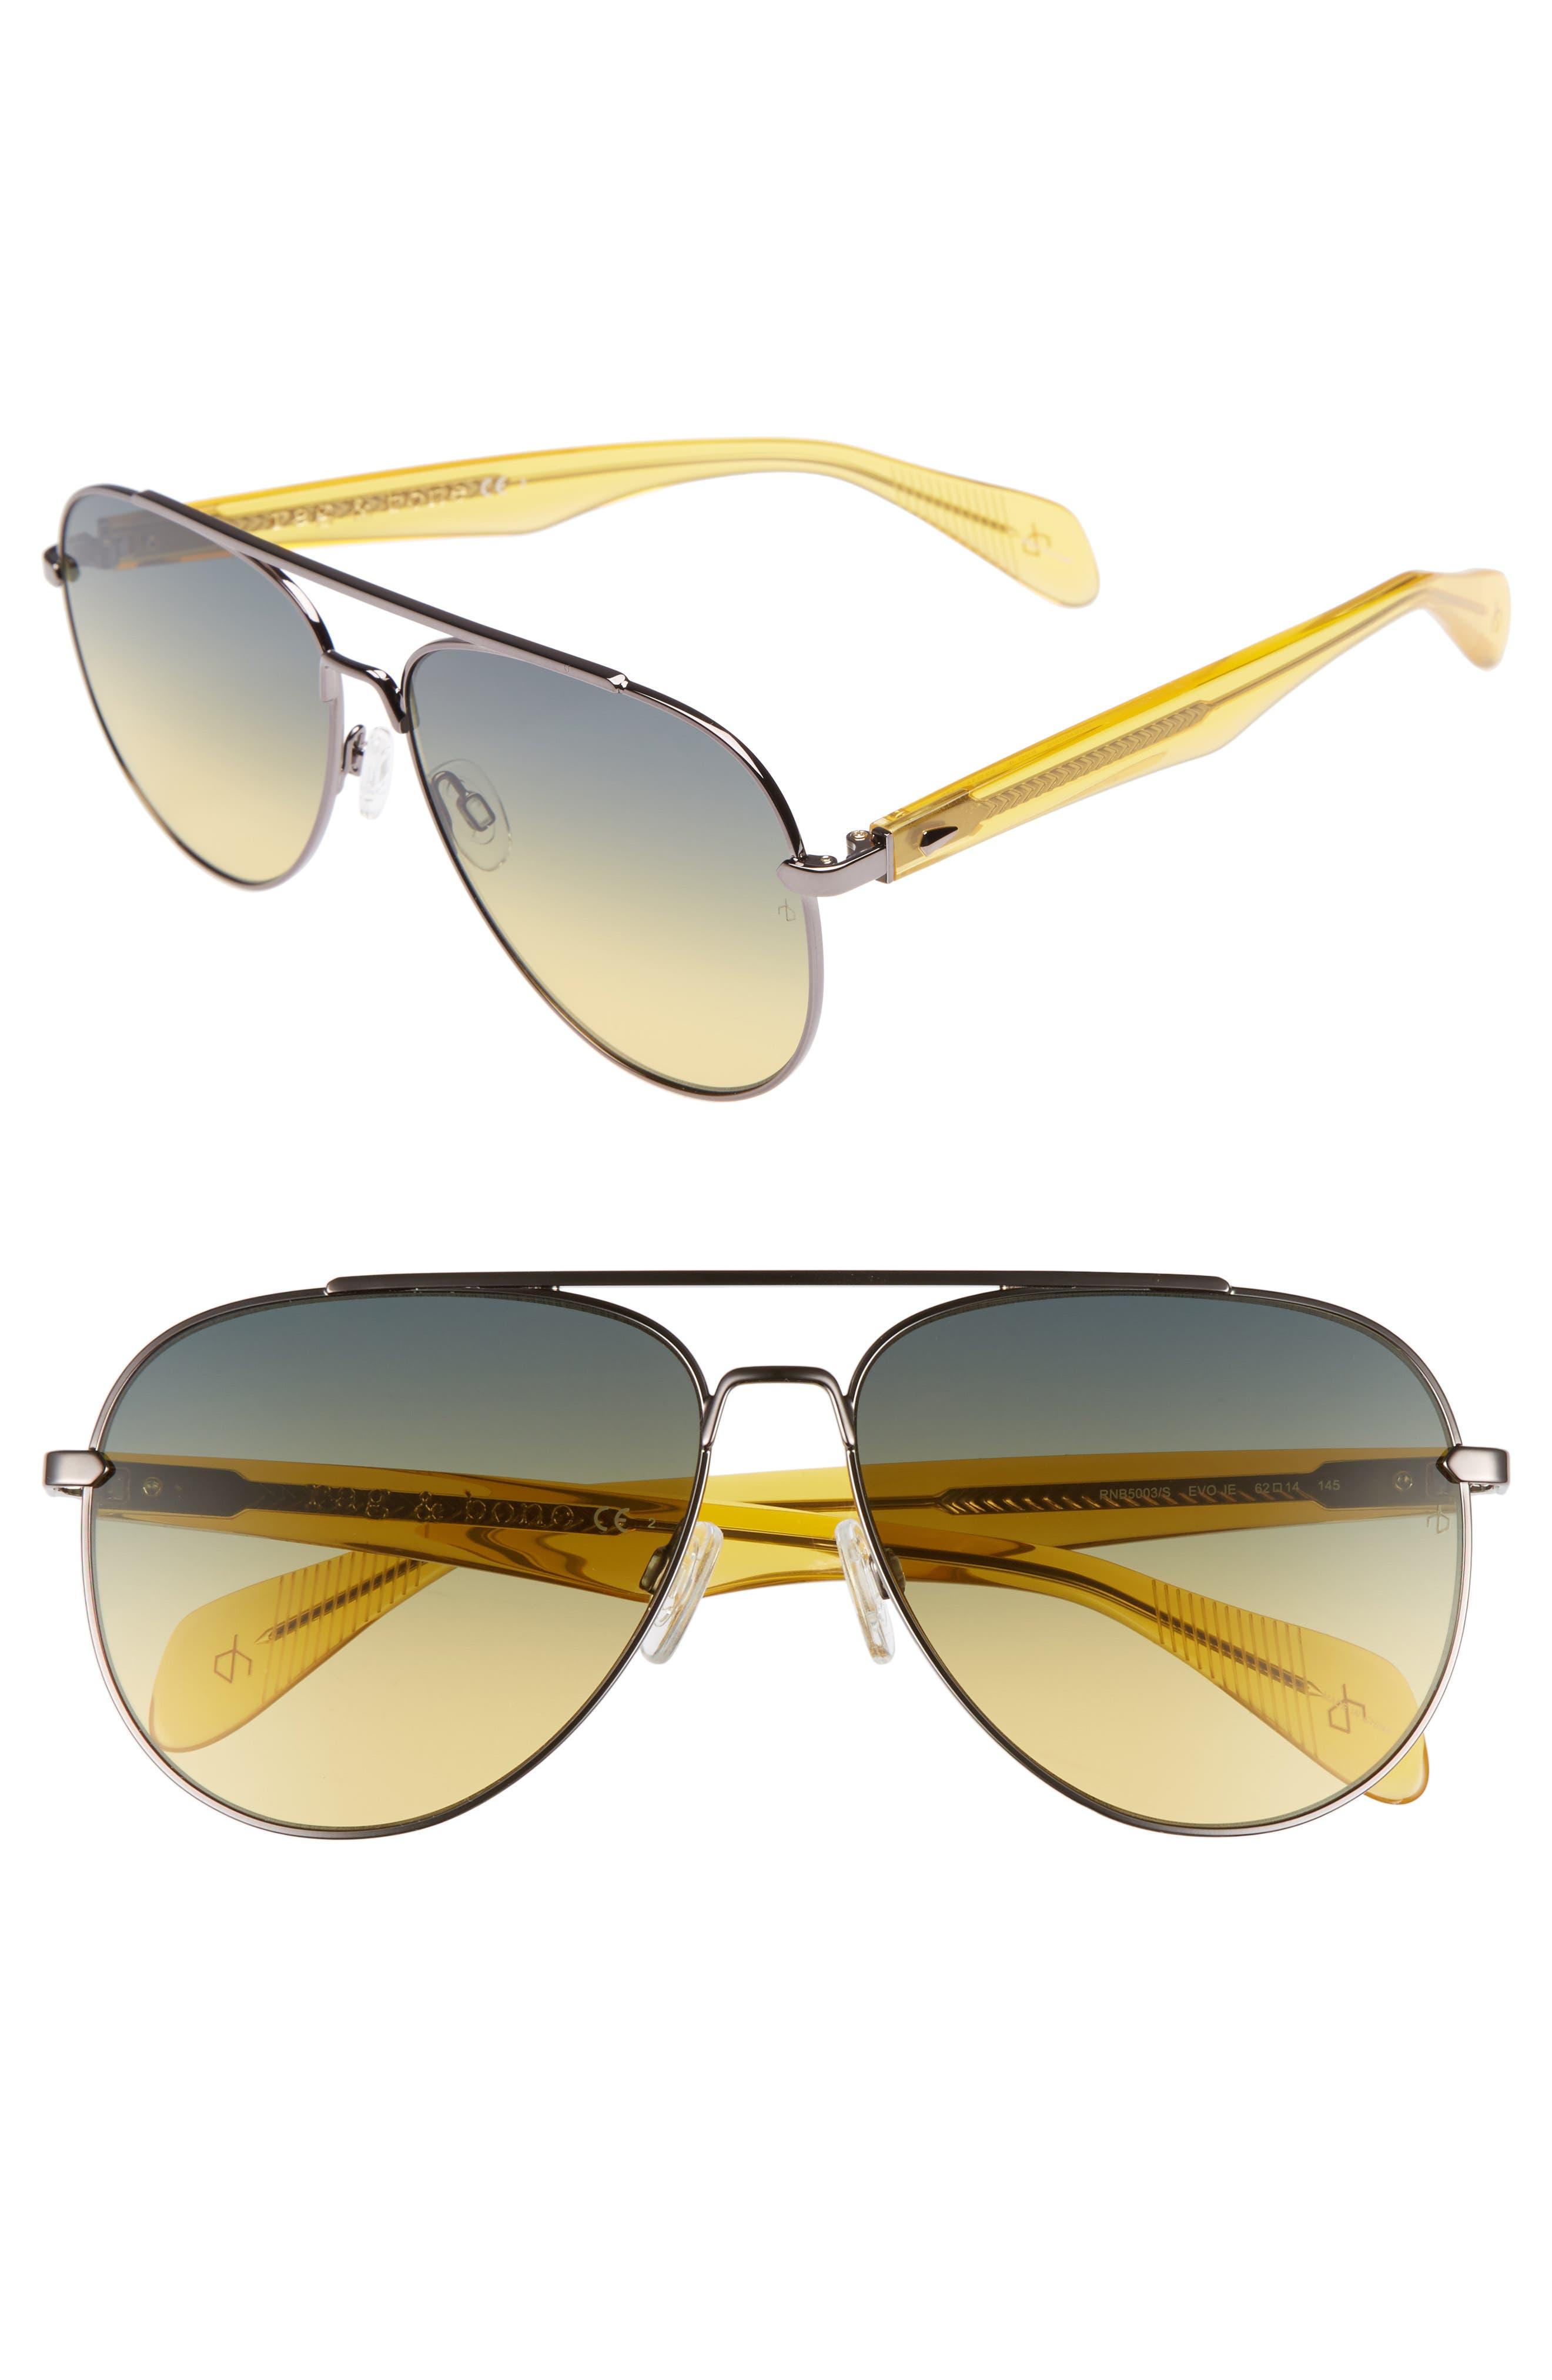 62mm Oversize Aviator Sunglasses,                         Main,                         color, 220